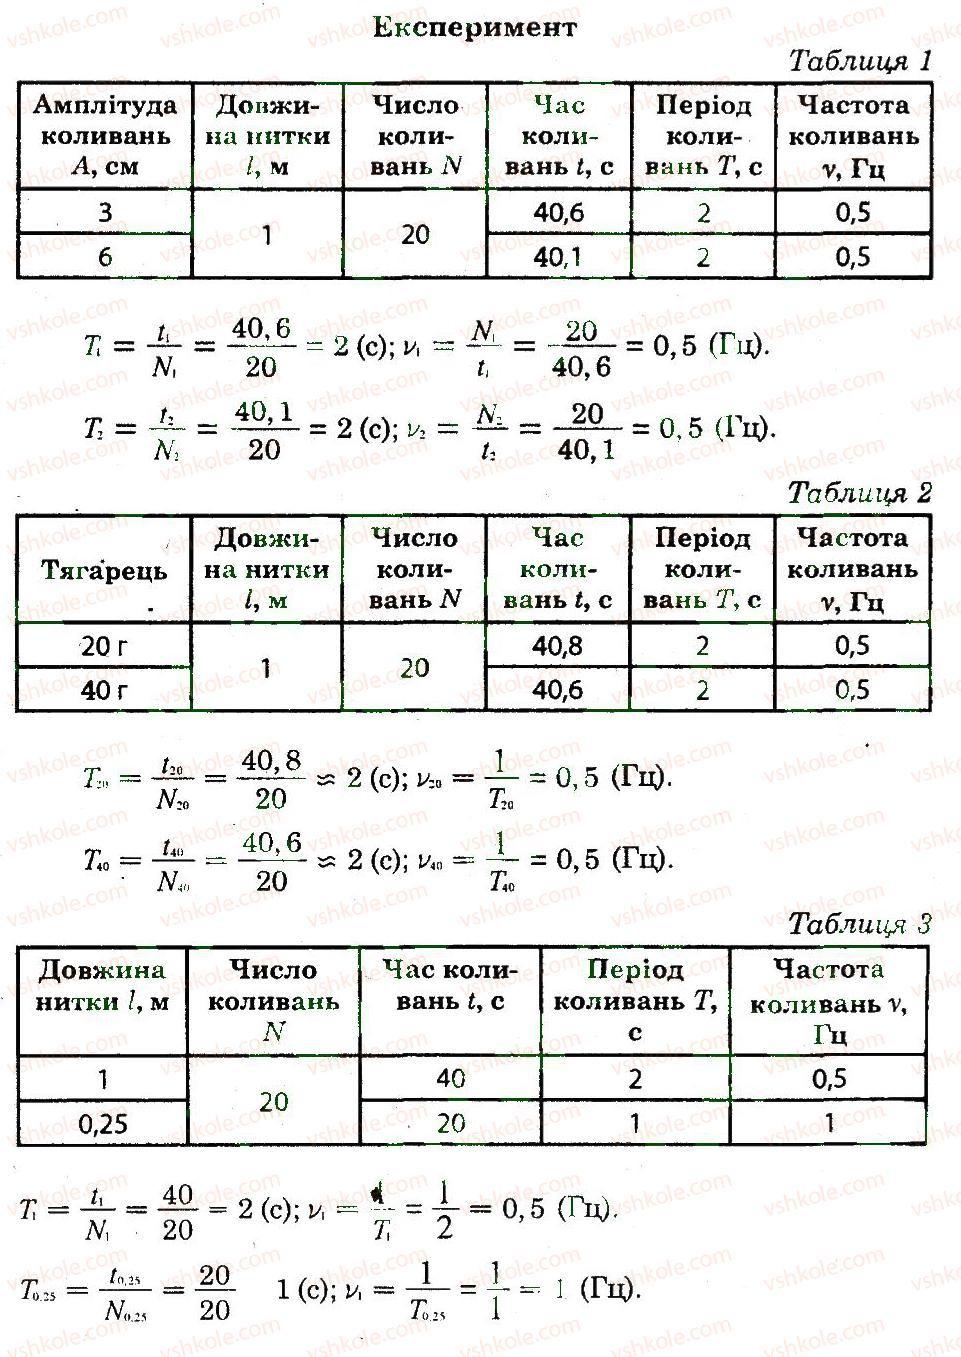 8-fizika-fya-bozhinova-oo-kiryuhina-2010-zoshit-dlya-laboratornih-robit--laboratorni-roboti-3-rnd8610.jpg